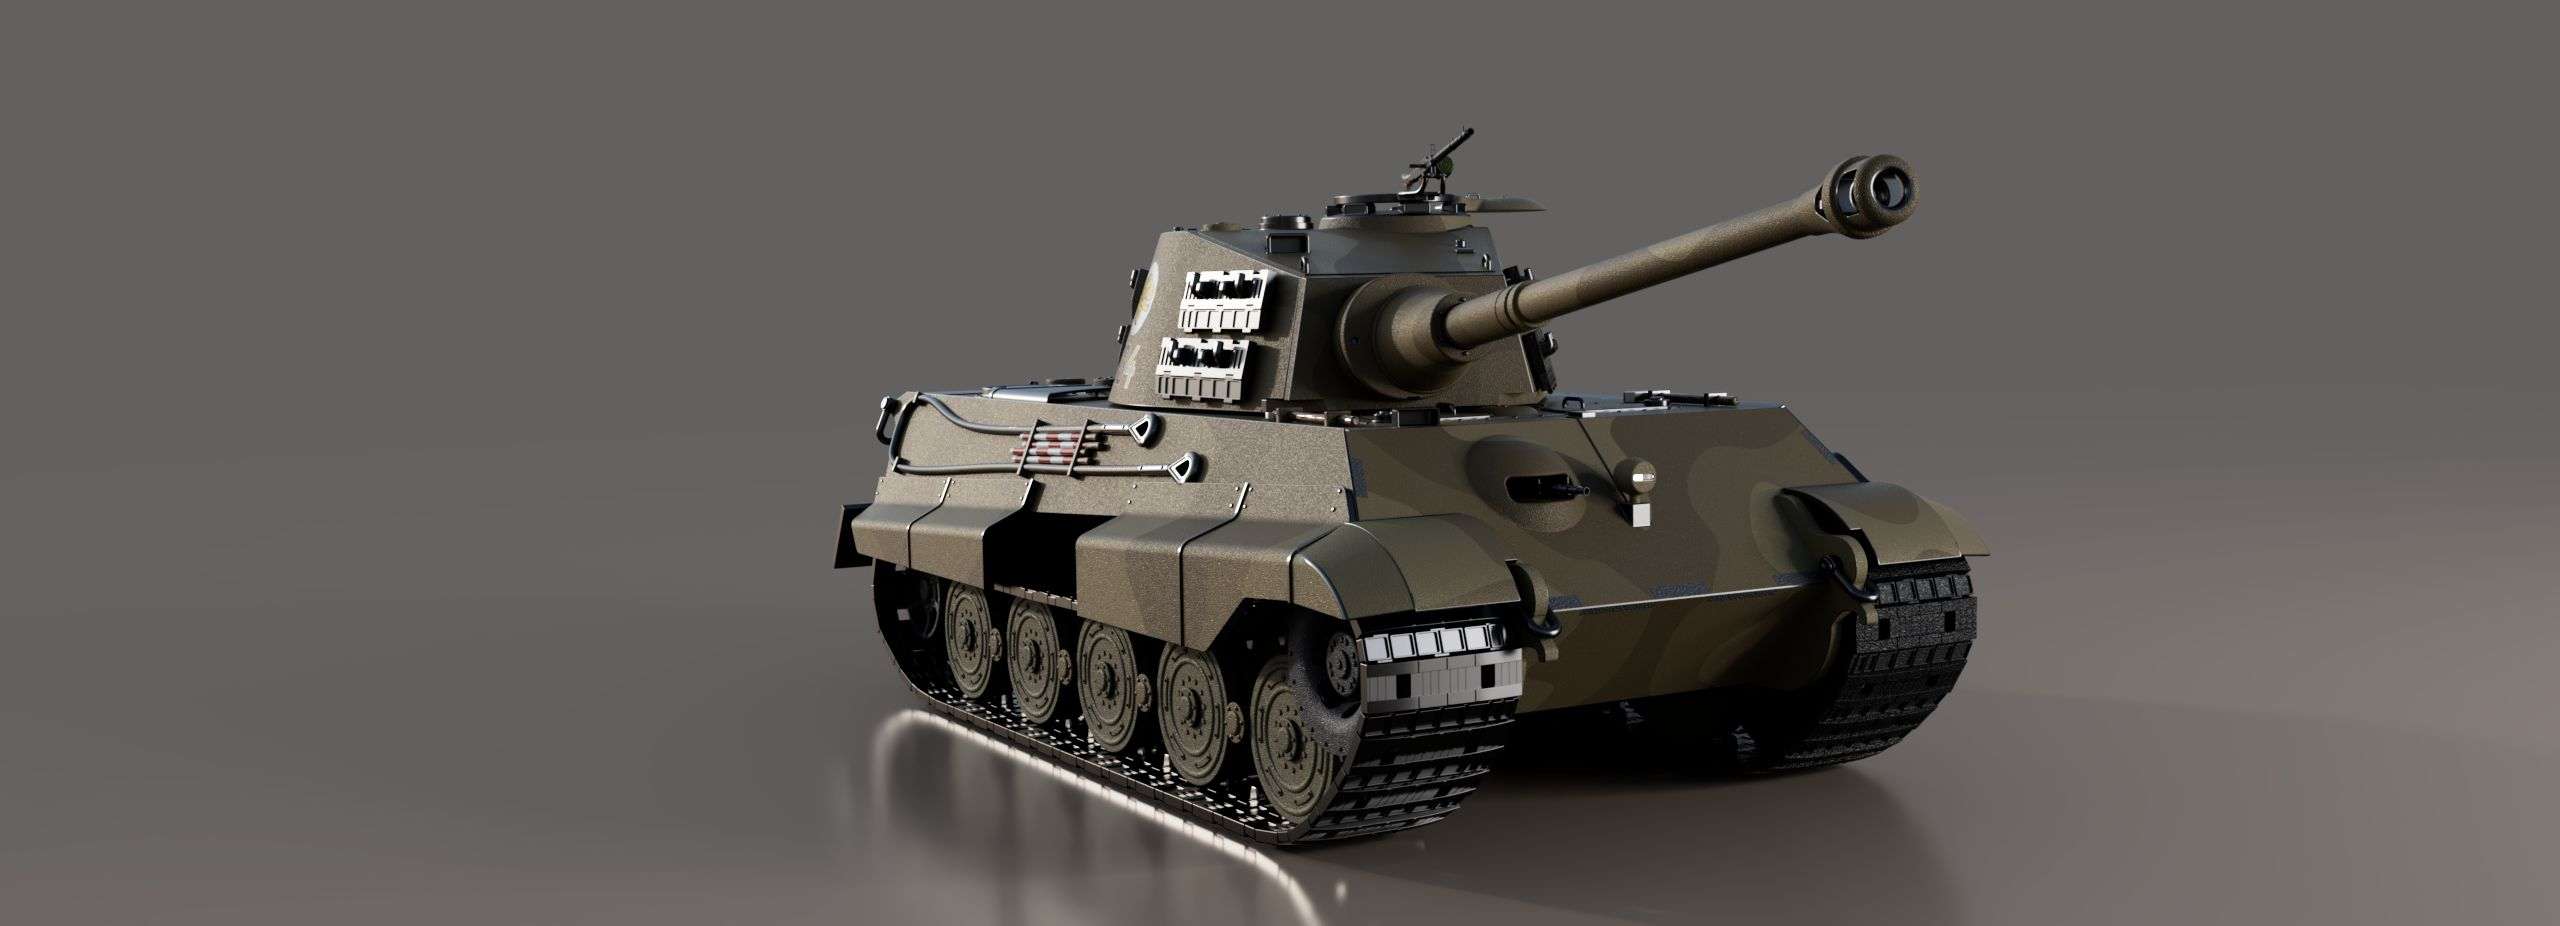 Tiger-ii-komplett-wuste-2018-sep-20-08-18-24am-000-customizedview43157608518-png-3500-3500